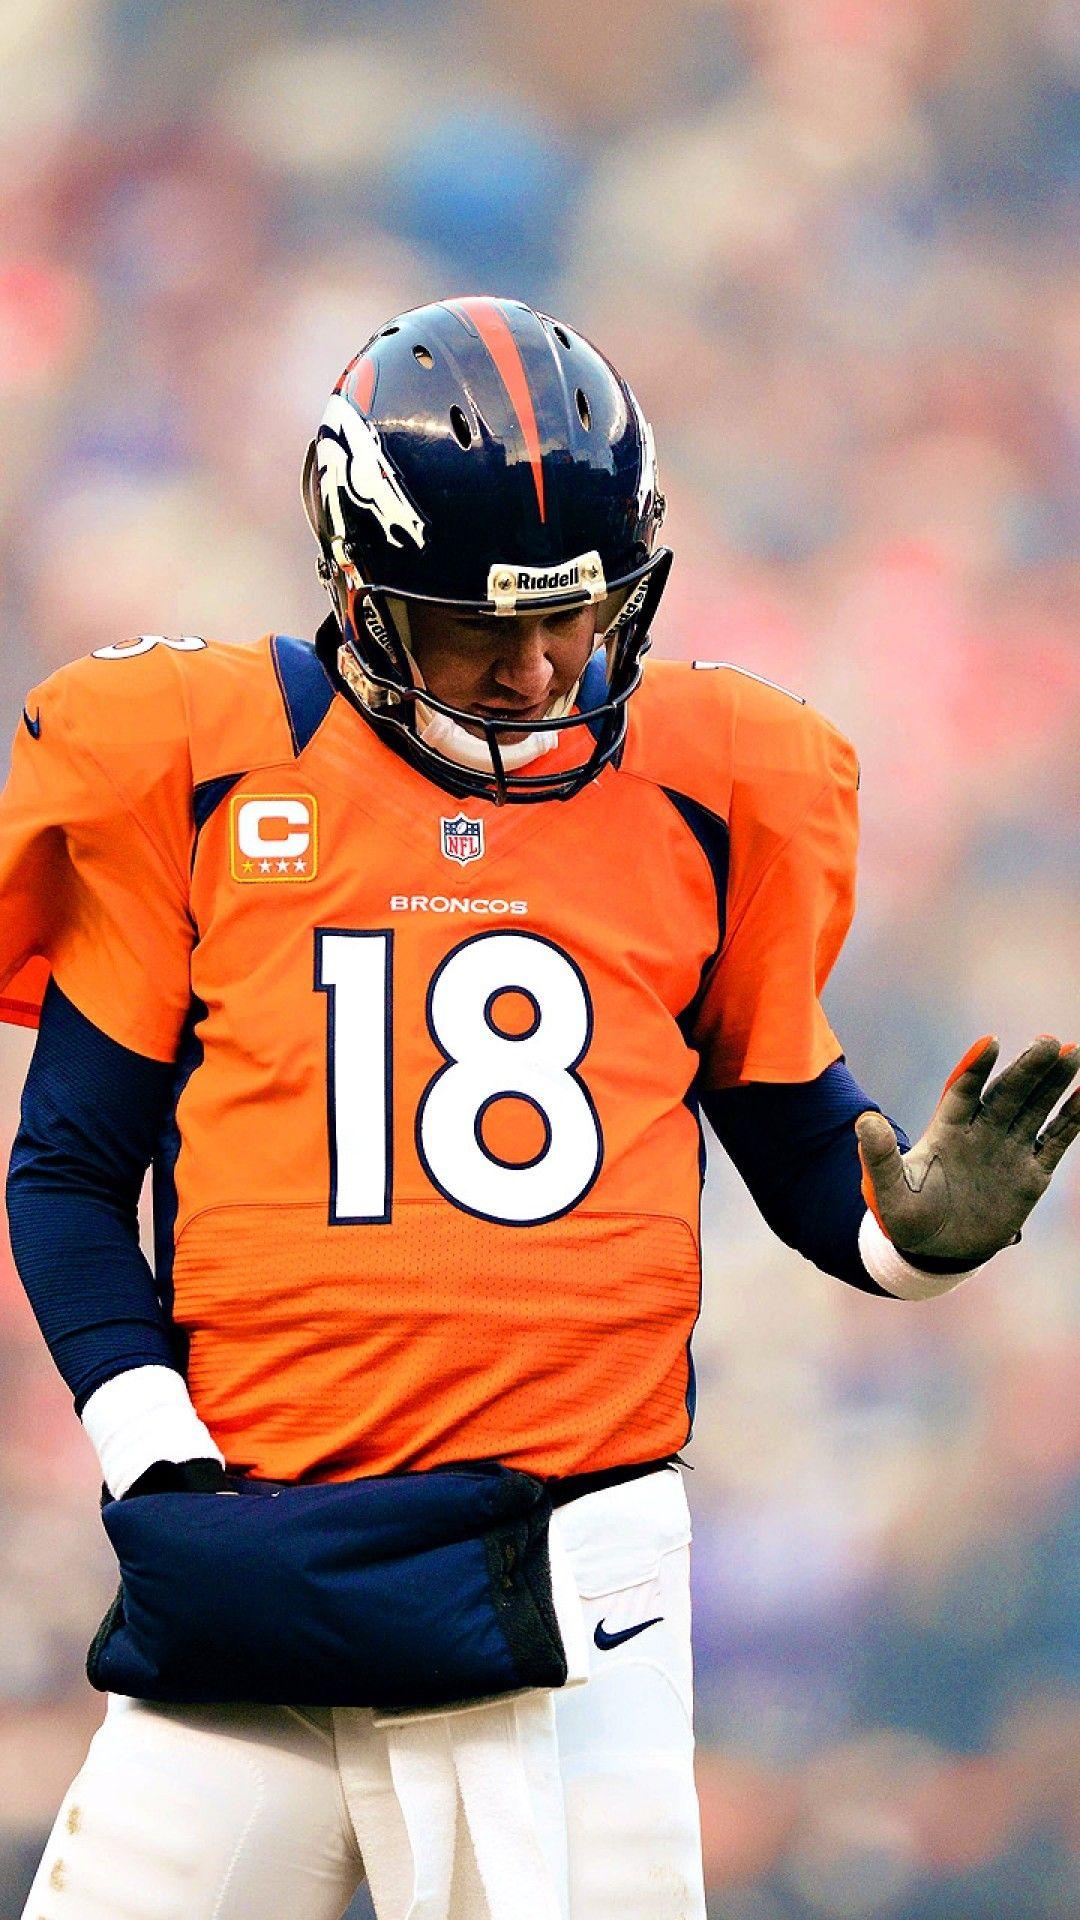 Broncos Image in 2020 Denver broncos, Broncos, Denver